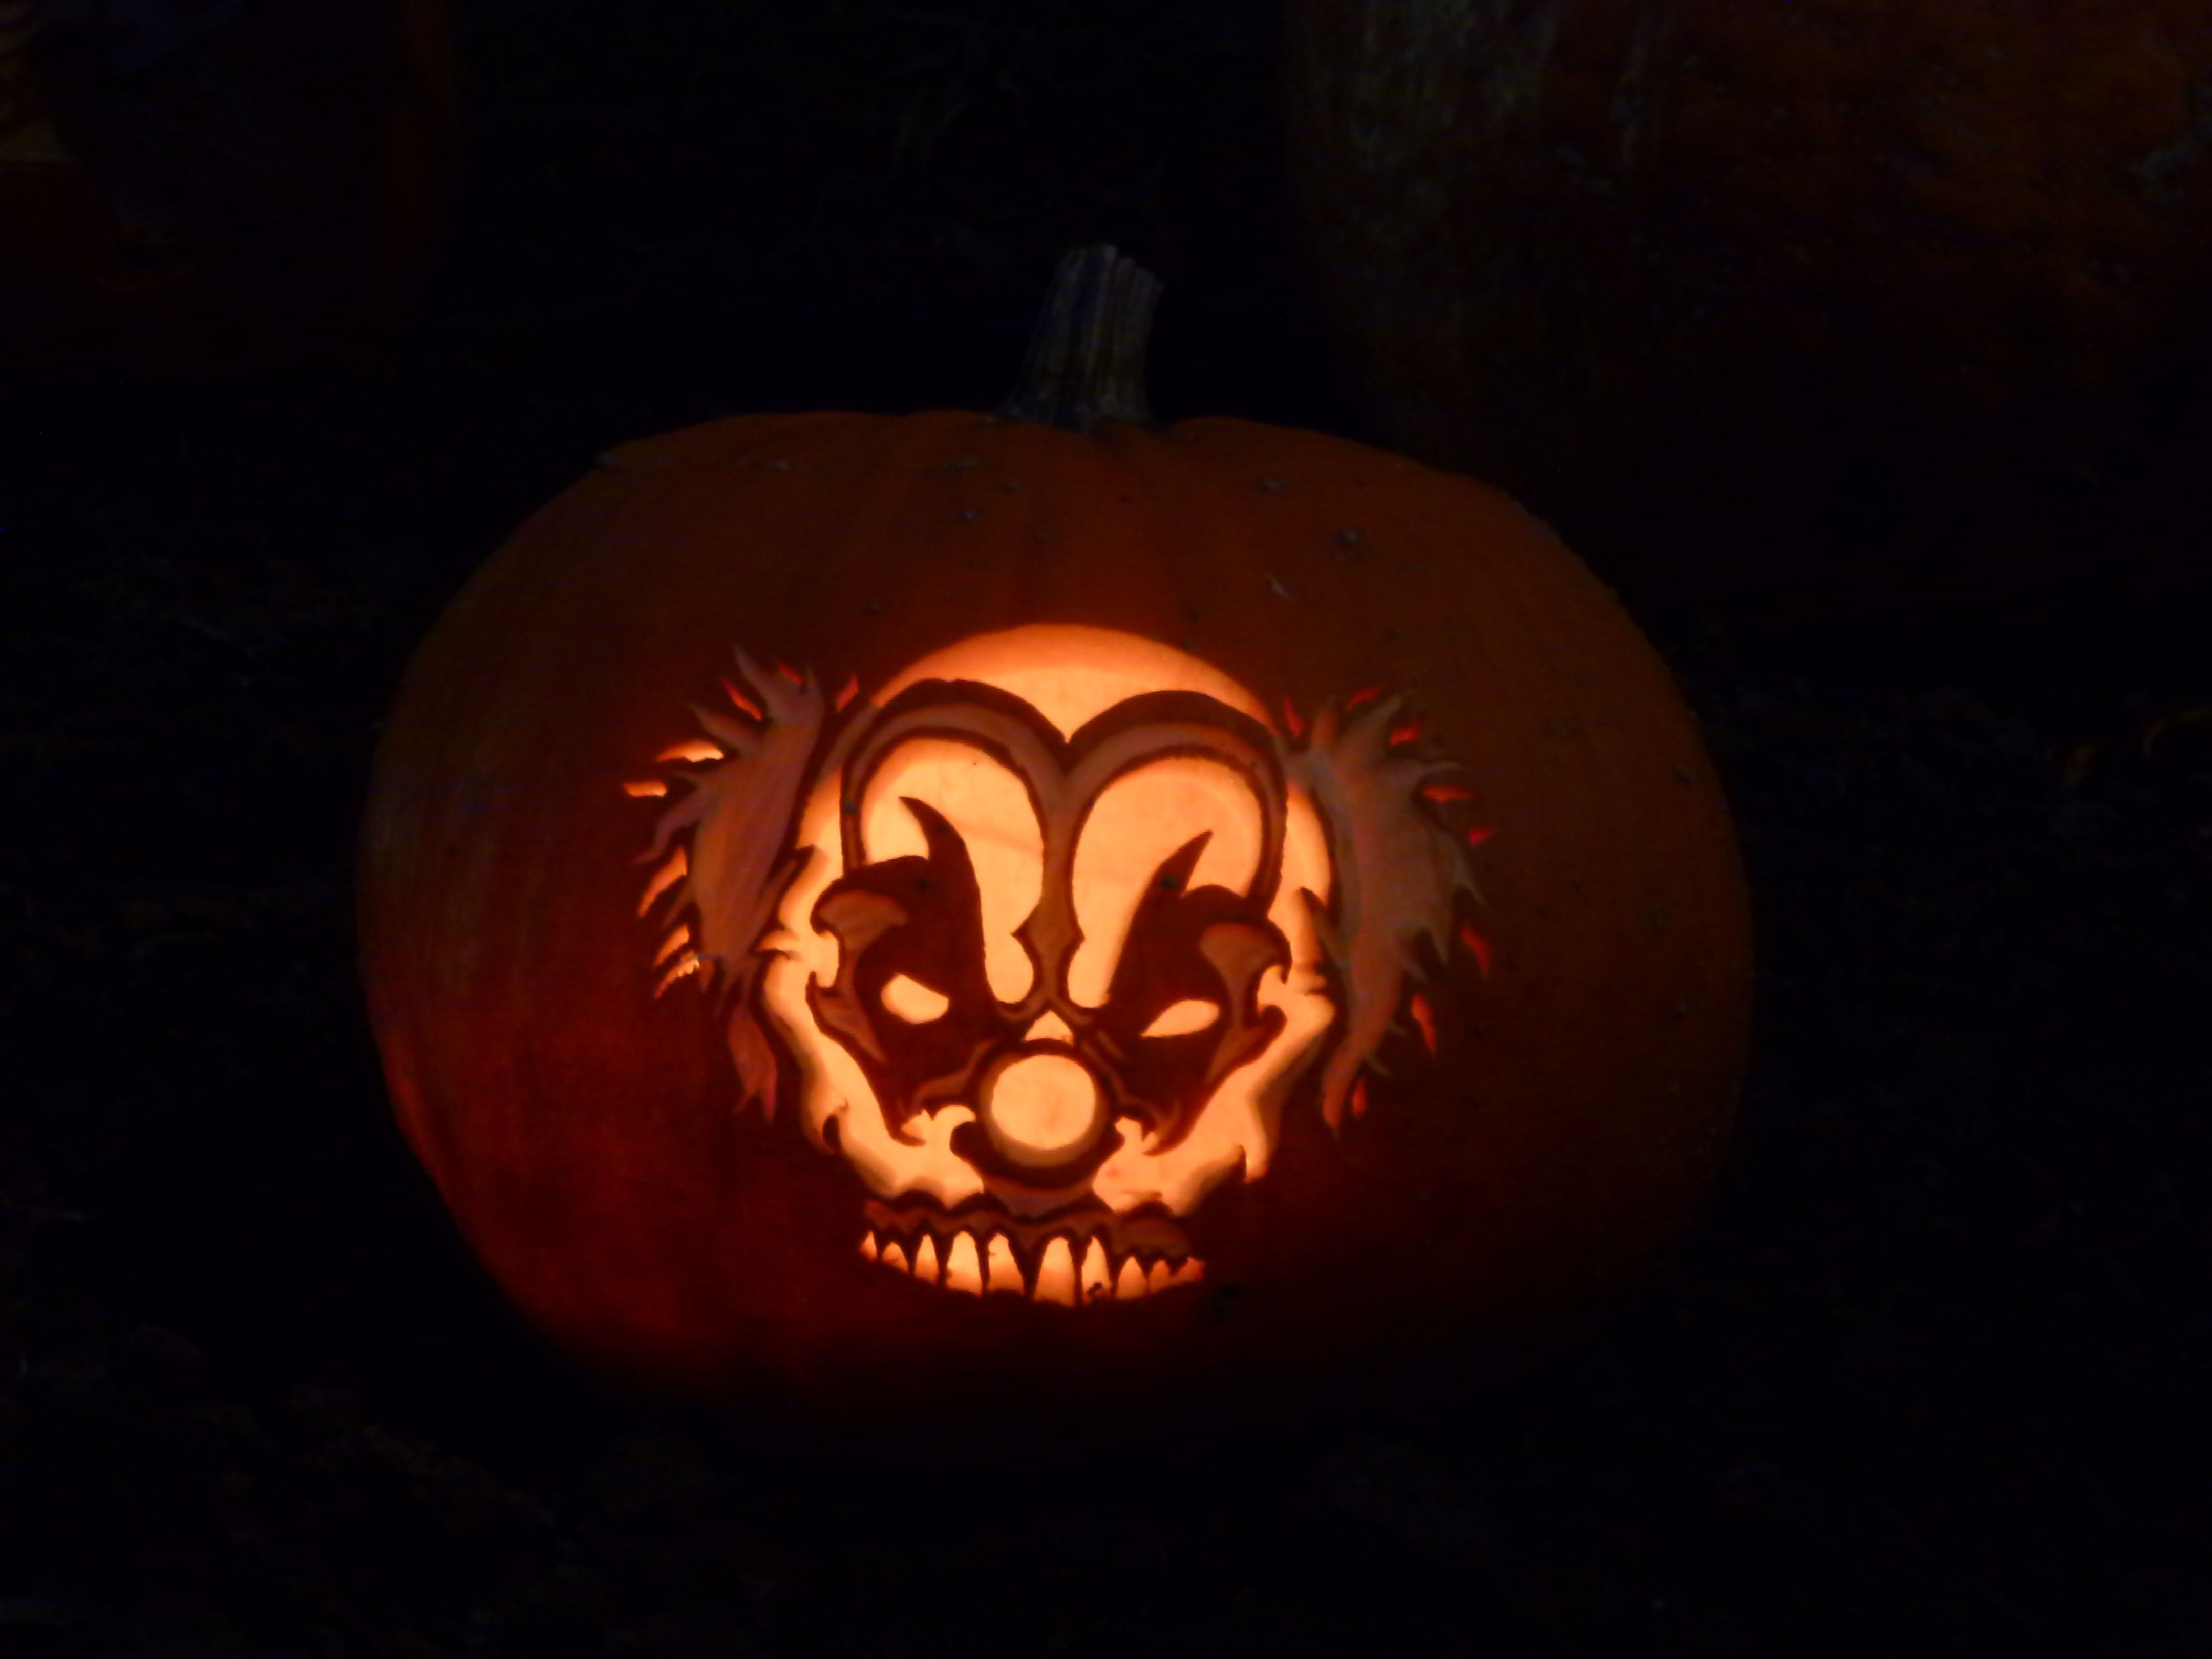 halloween pumpkins 2011 evil clown skull pattern by